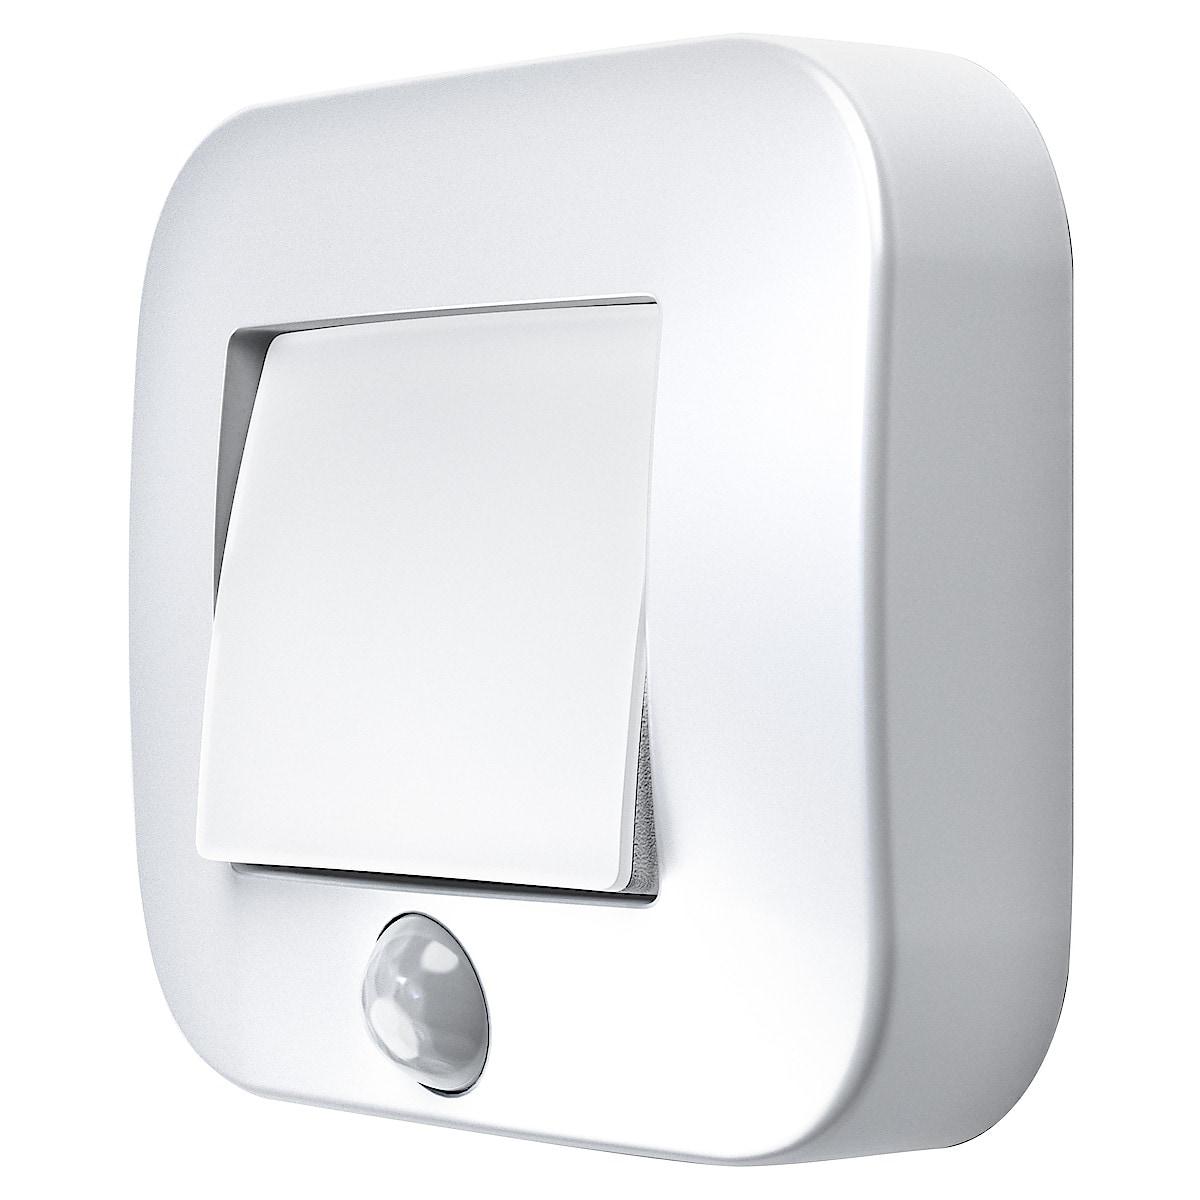 LED-belysning Nightlux Hall med sensor Osram